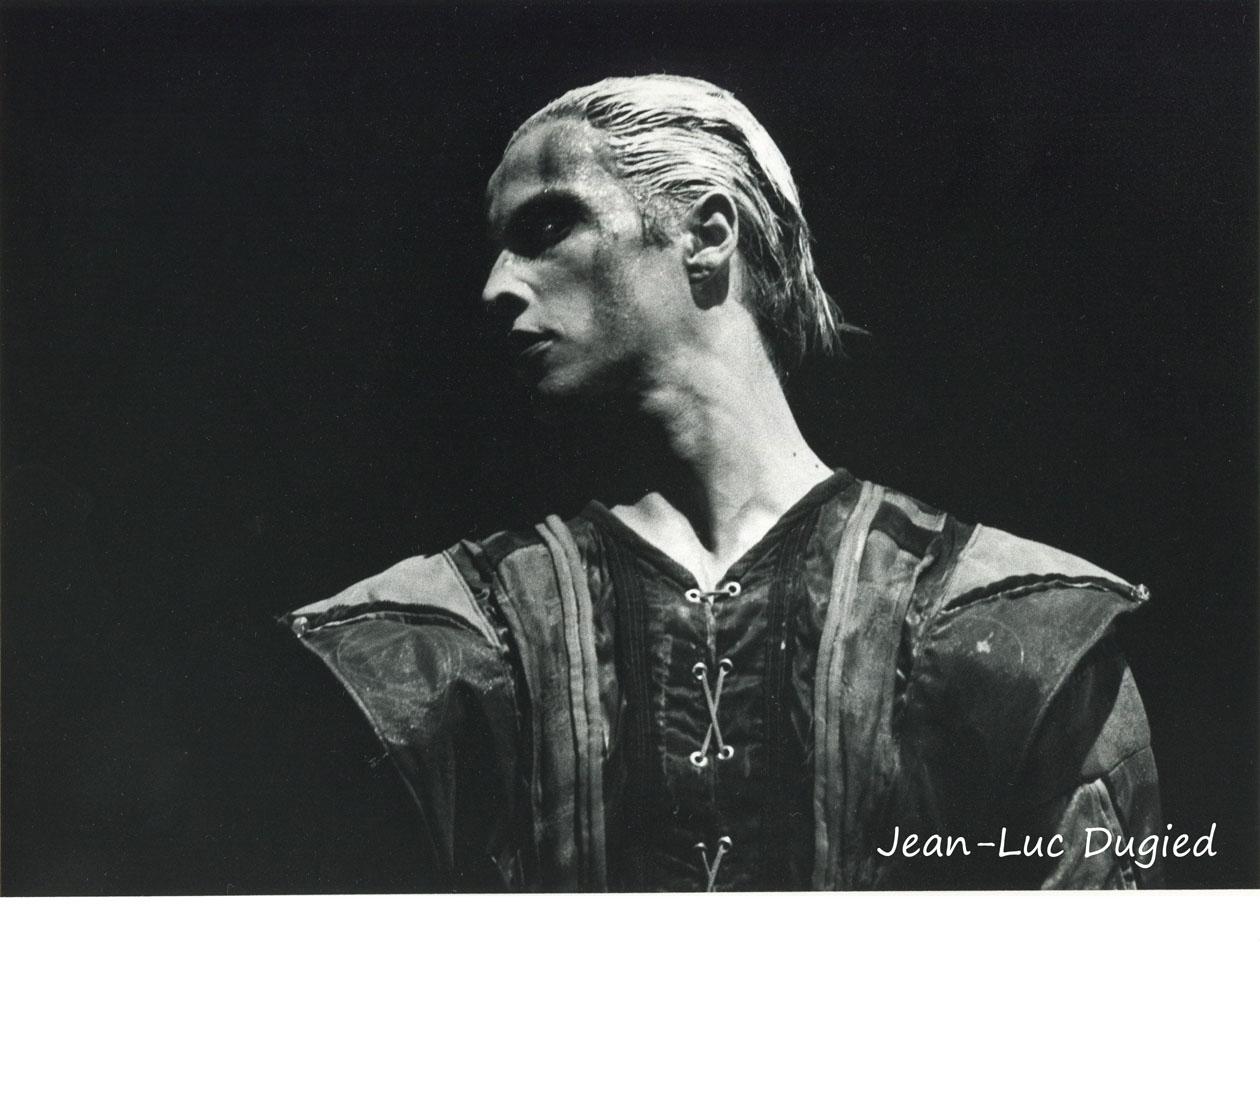 16 Brumachon Claude - Oc le narquois et Oriane l'effraie - Benjamin Lamarche - 1985